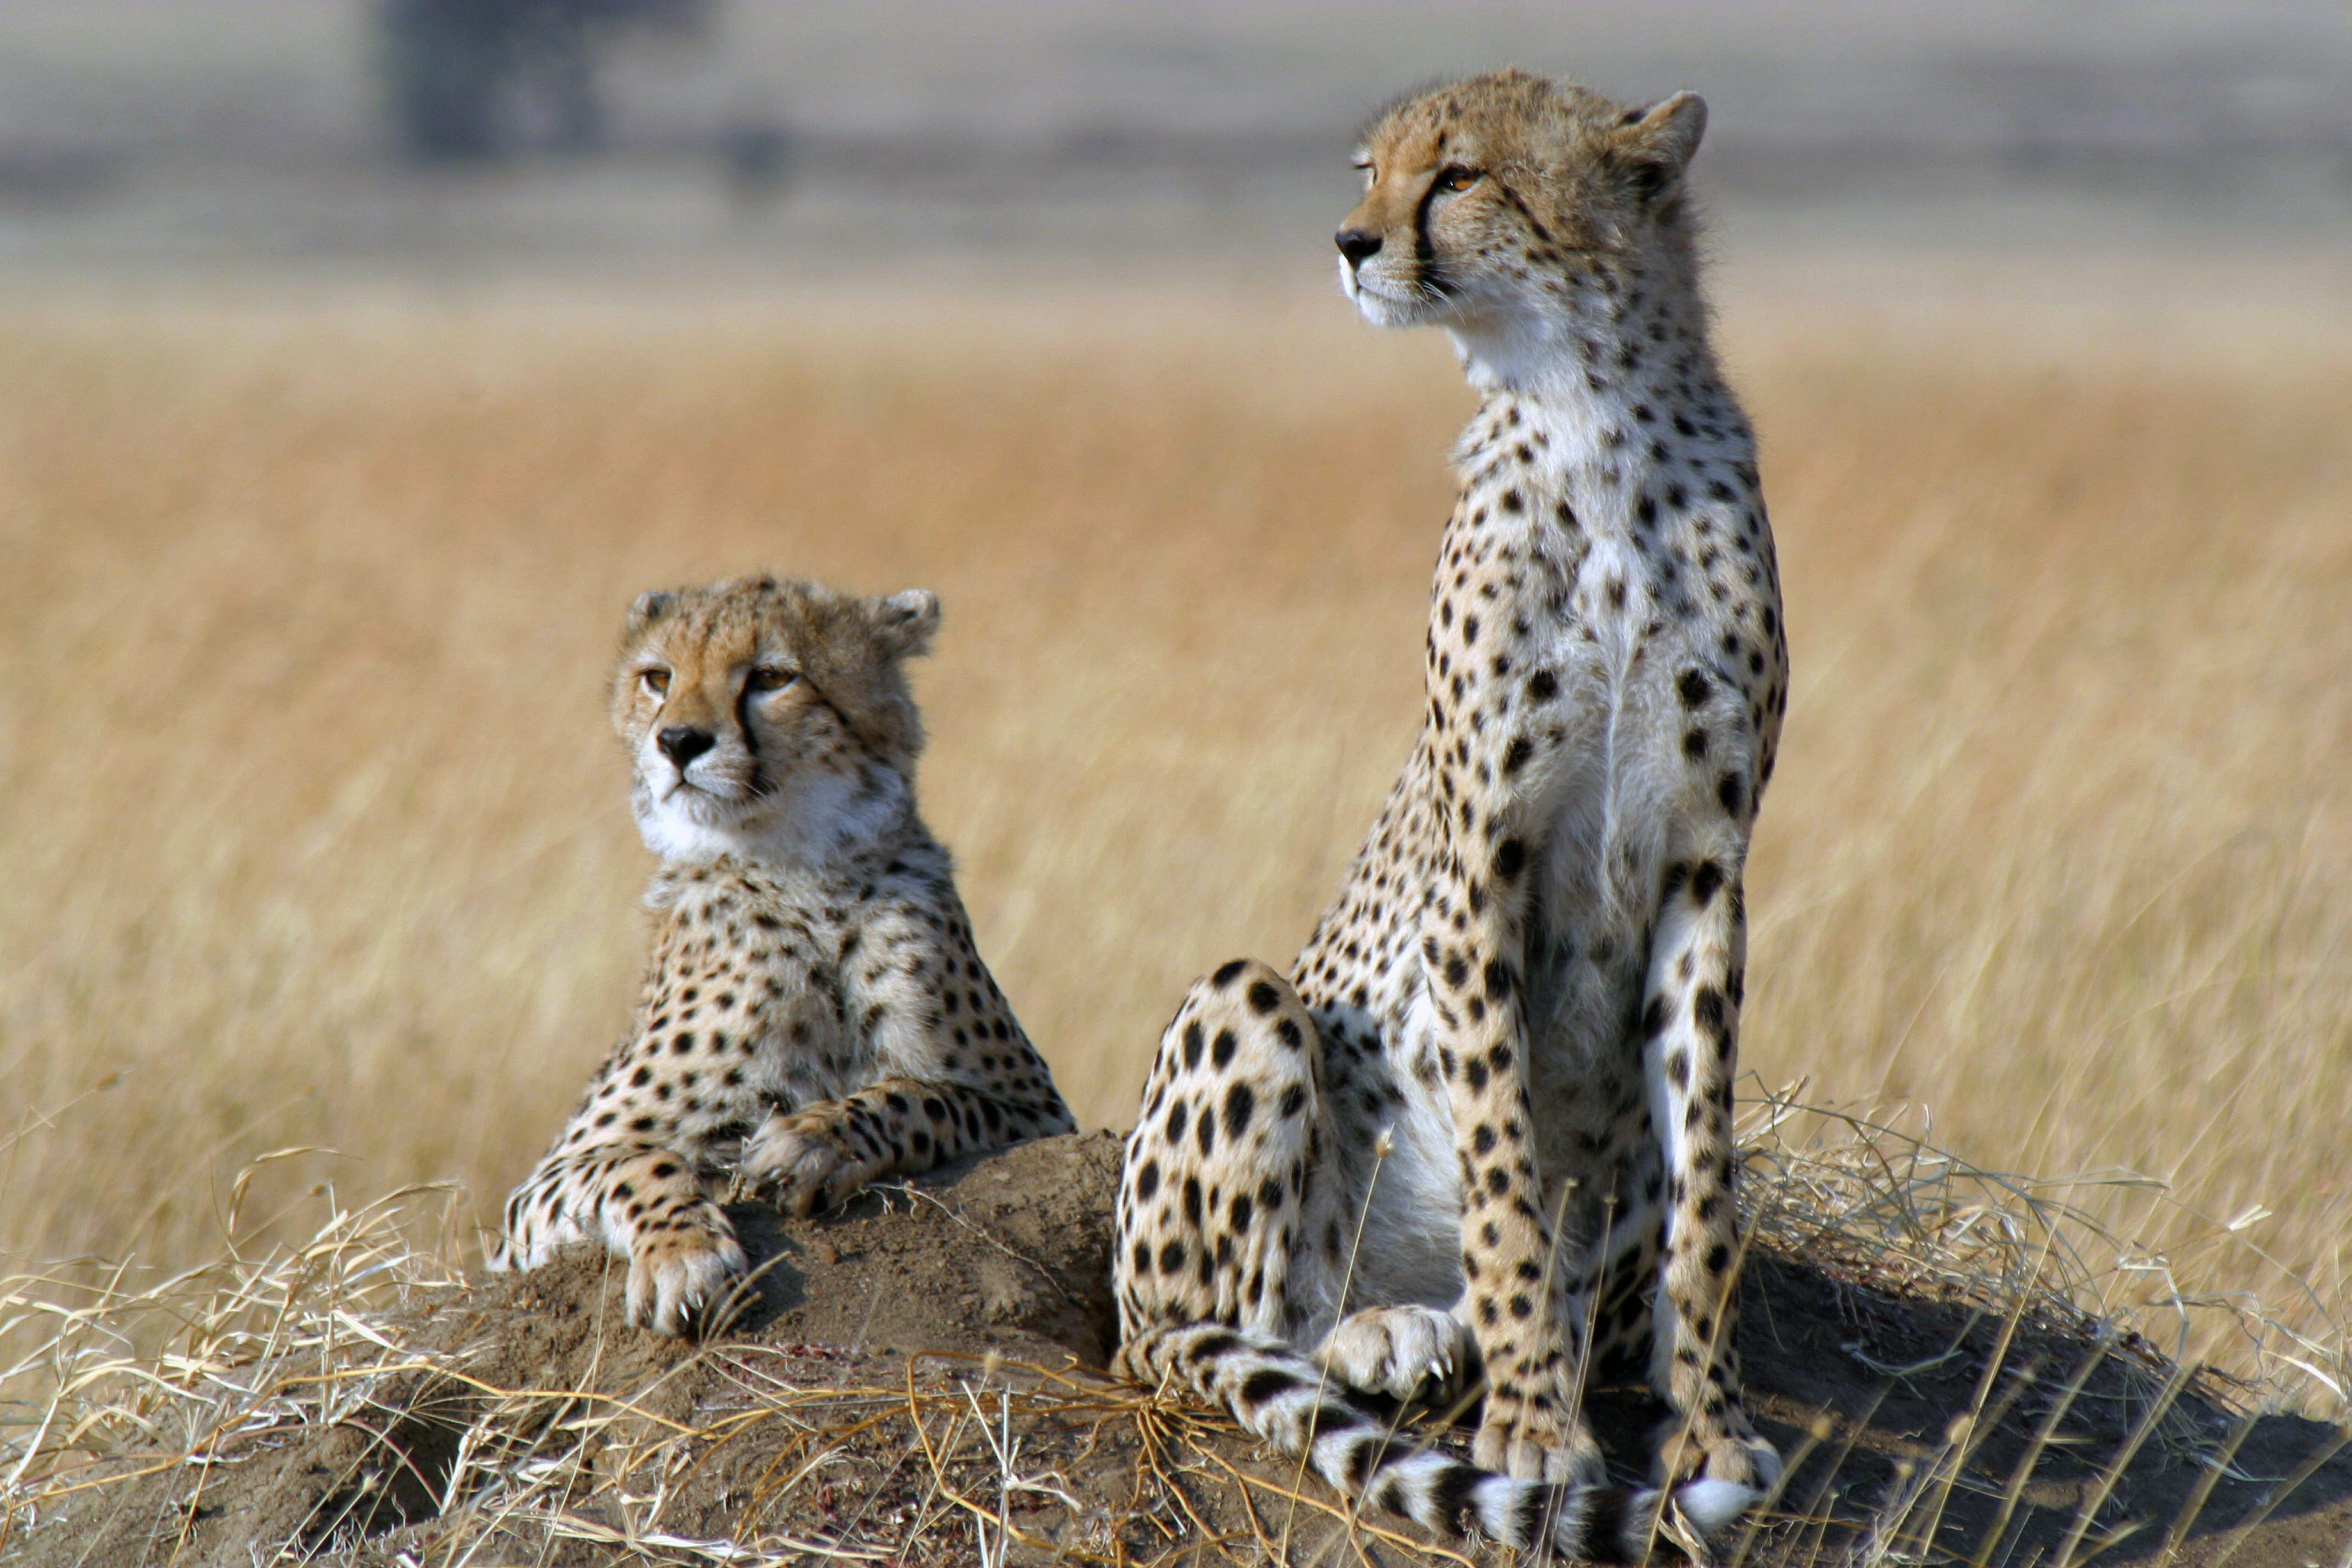 Tanzania Cheetah Conservation Program